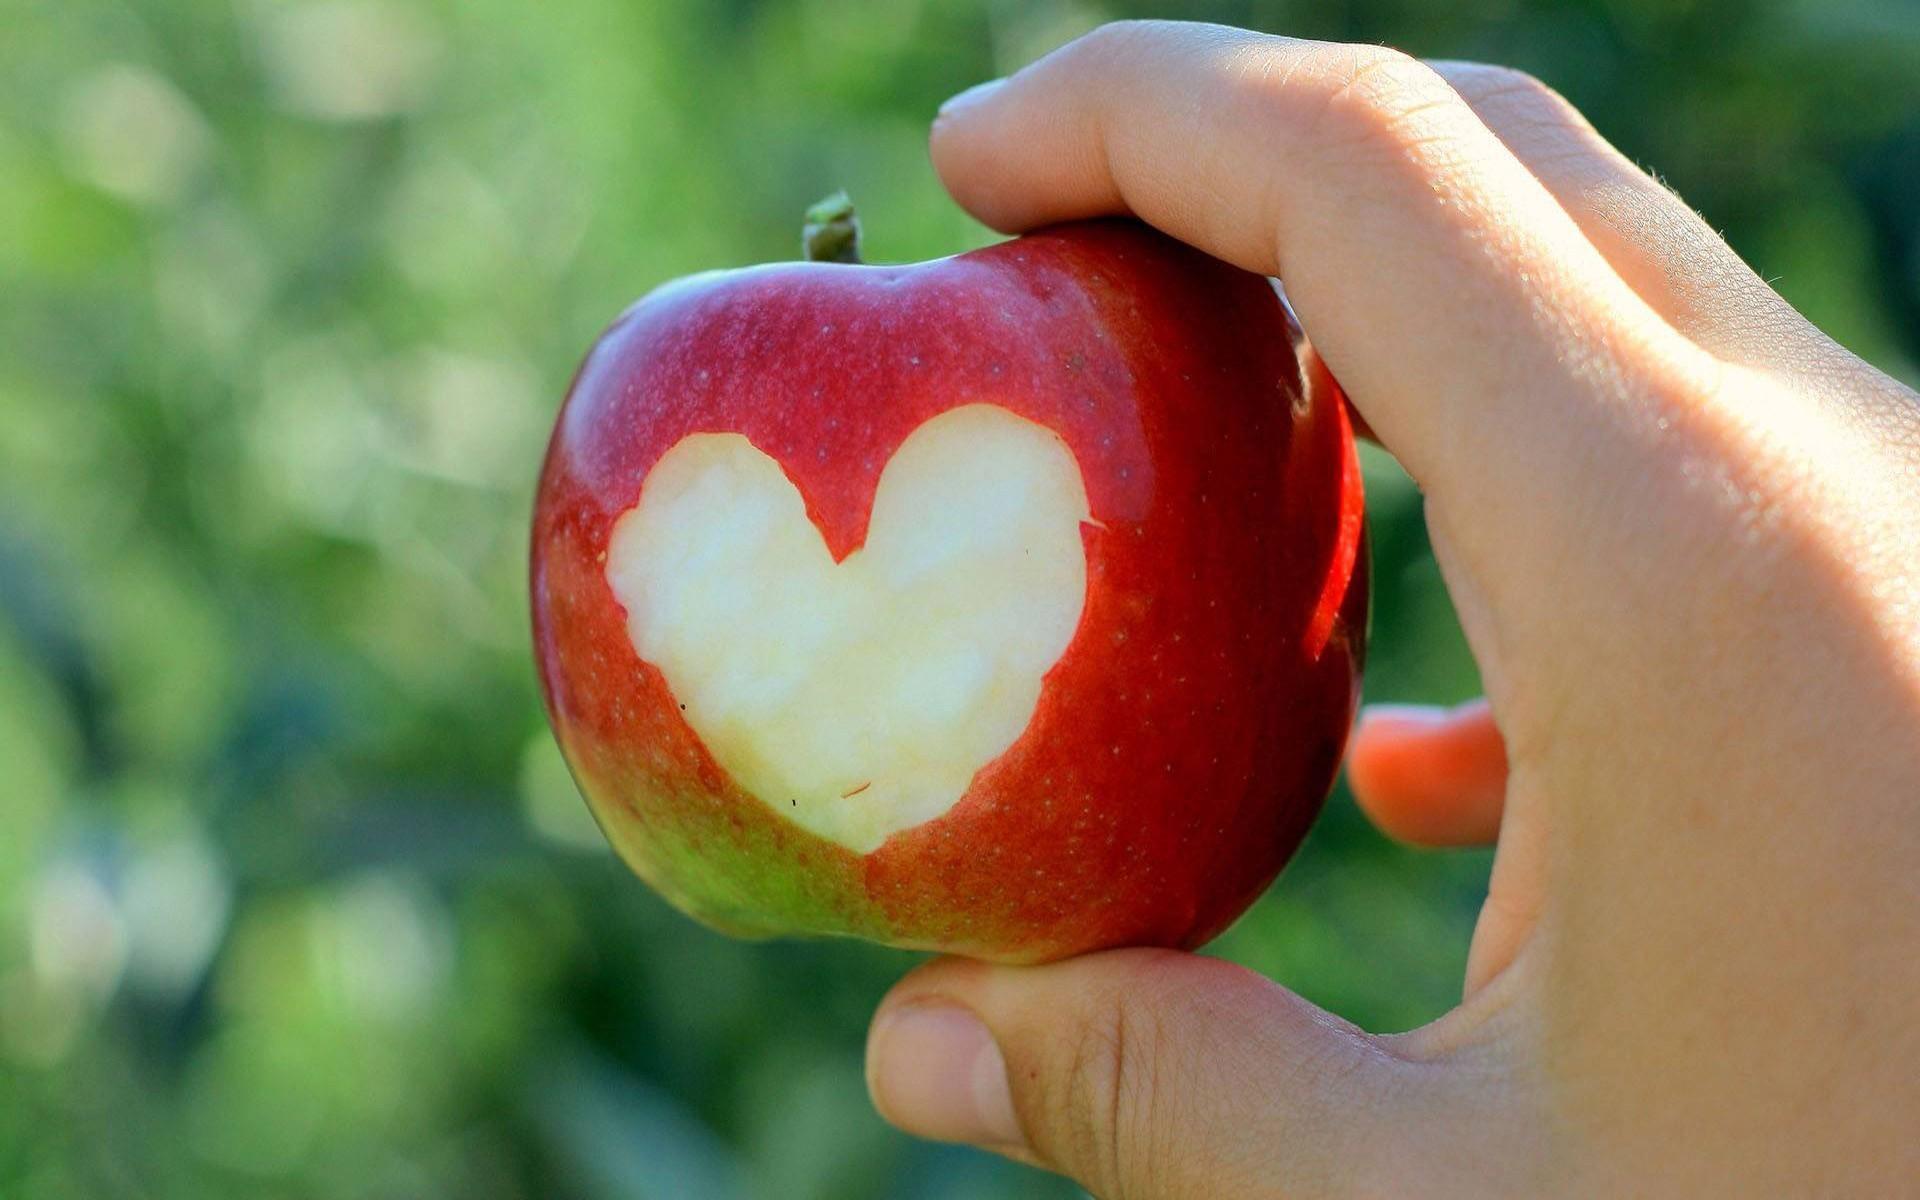 Apples Hearts